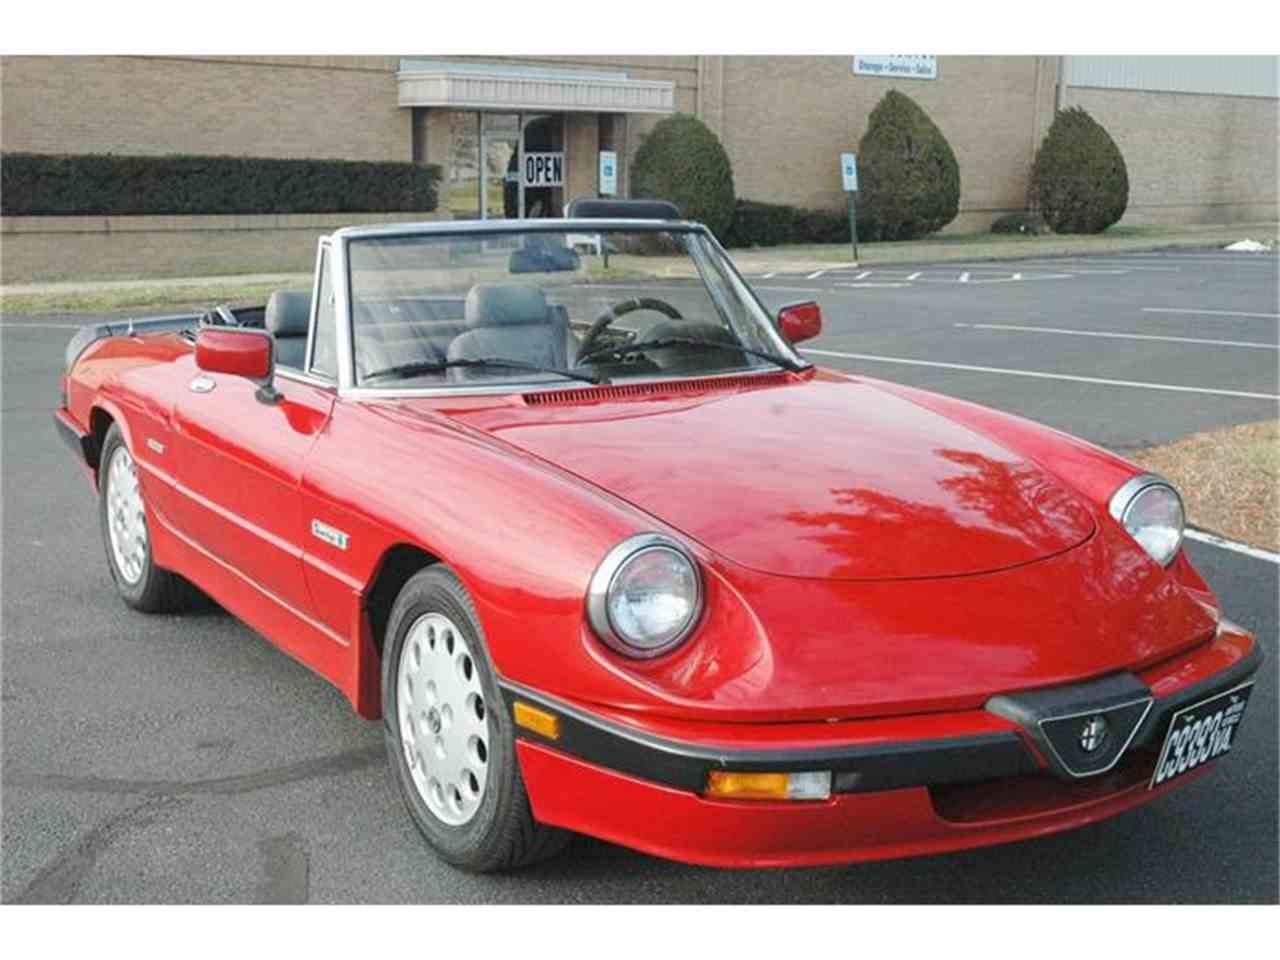 1988 Alfa Romeo Spider Quadrifoglio 5-Spd All the ...  |1988 Alfa Romeo Quadrifoglio